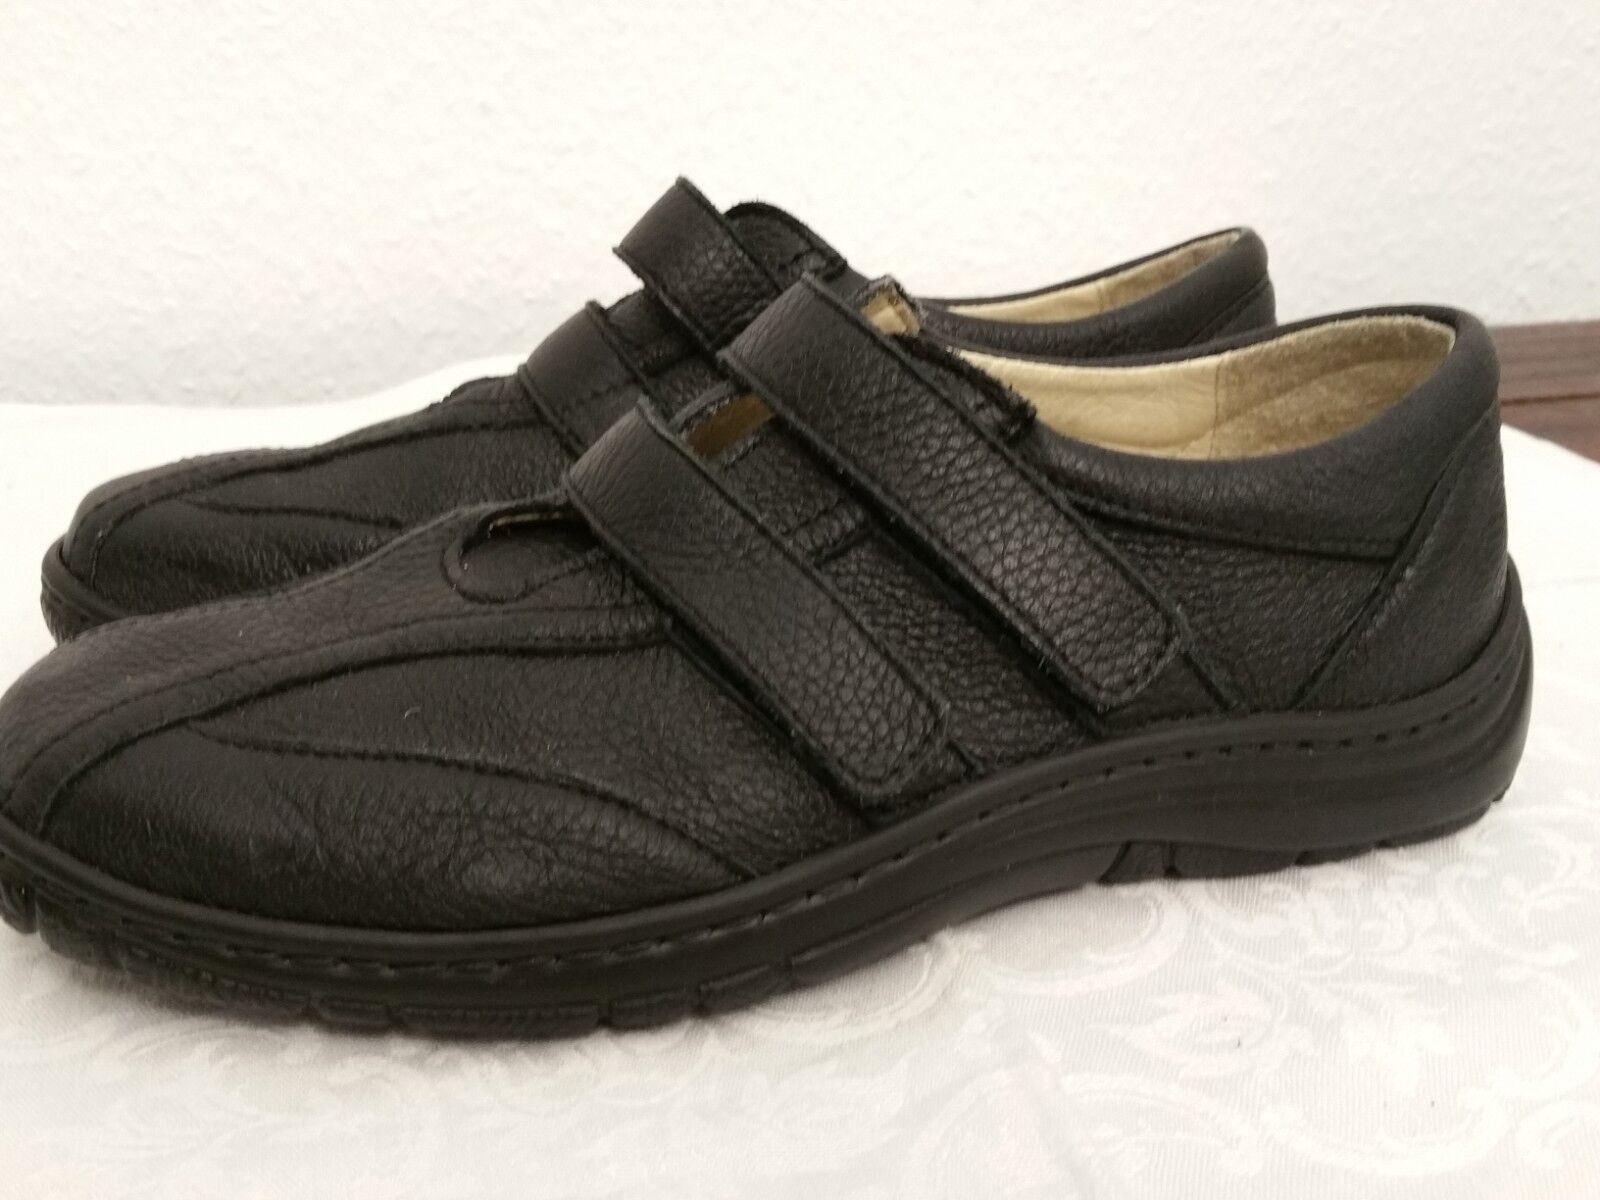 1425---Vitaform Schuhe Gr 40 weite H Leder,neu